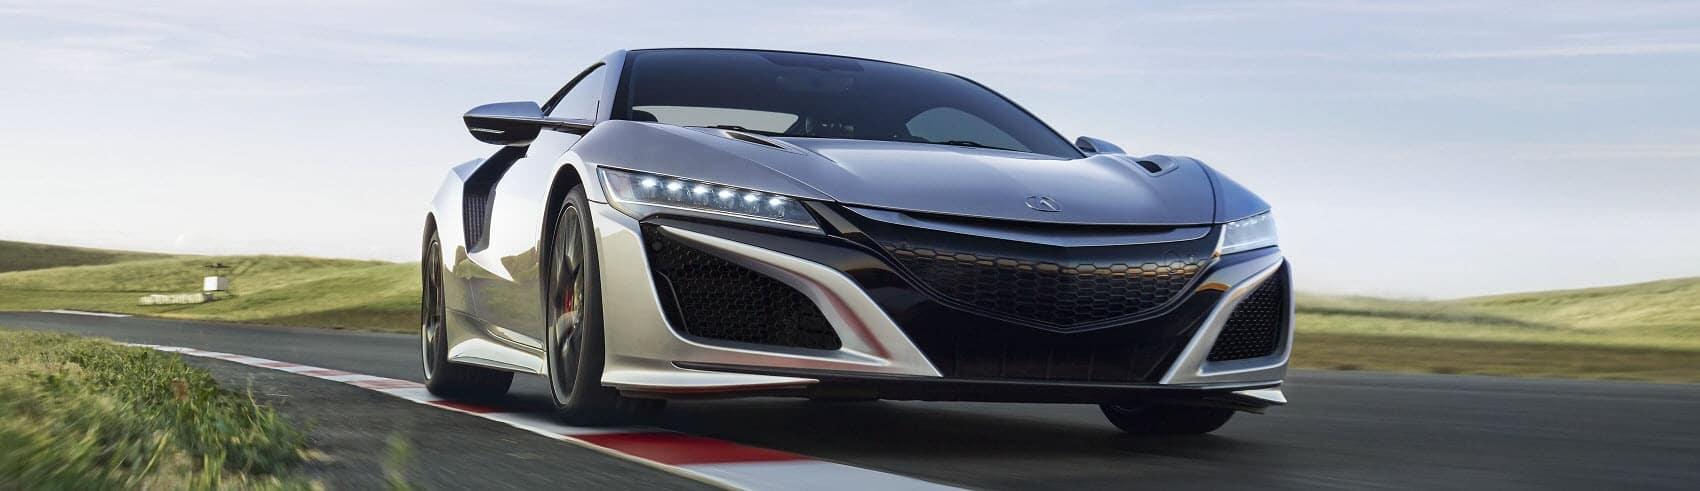 2019 Acura NSX Engine Specs